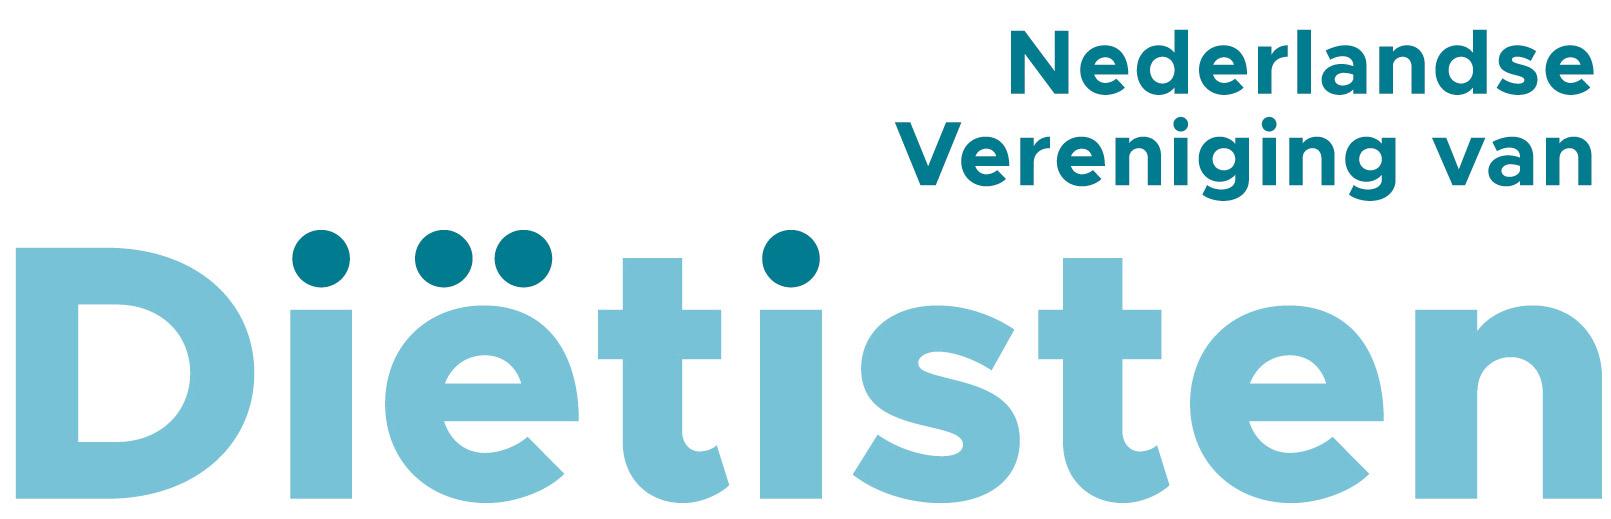 NVD logo - Janneke Kramer - Marum, Westerkwartier